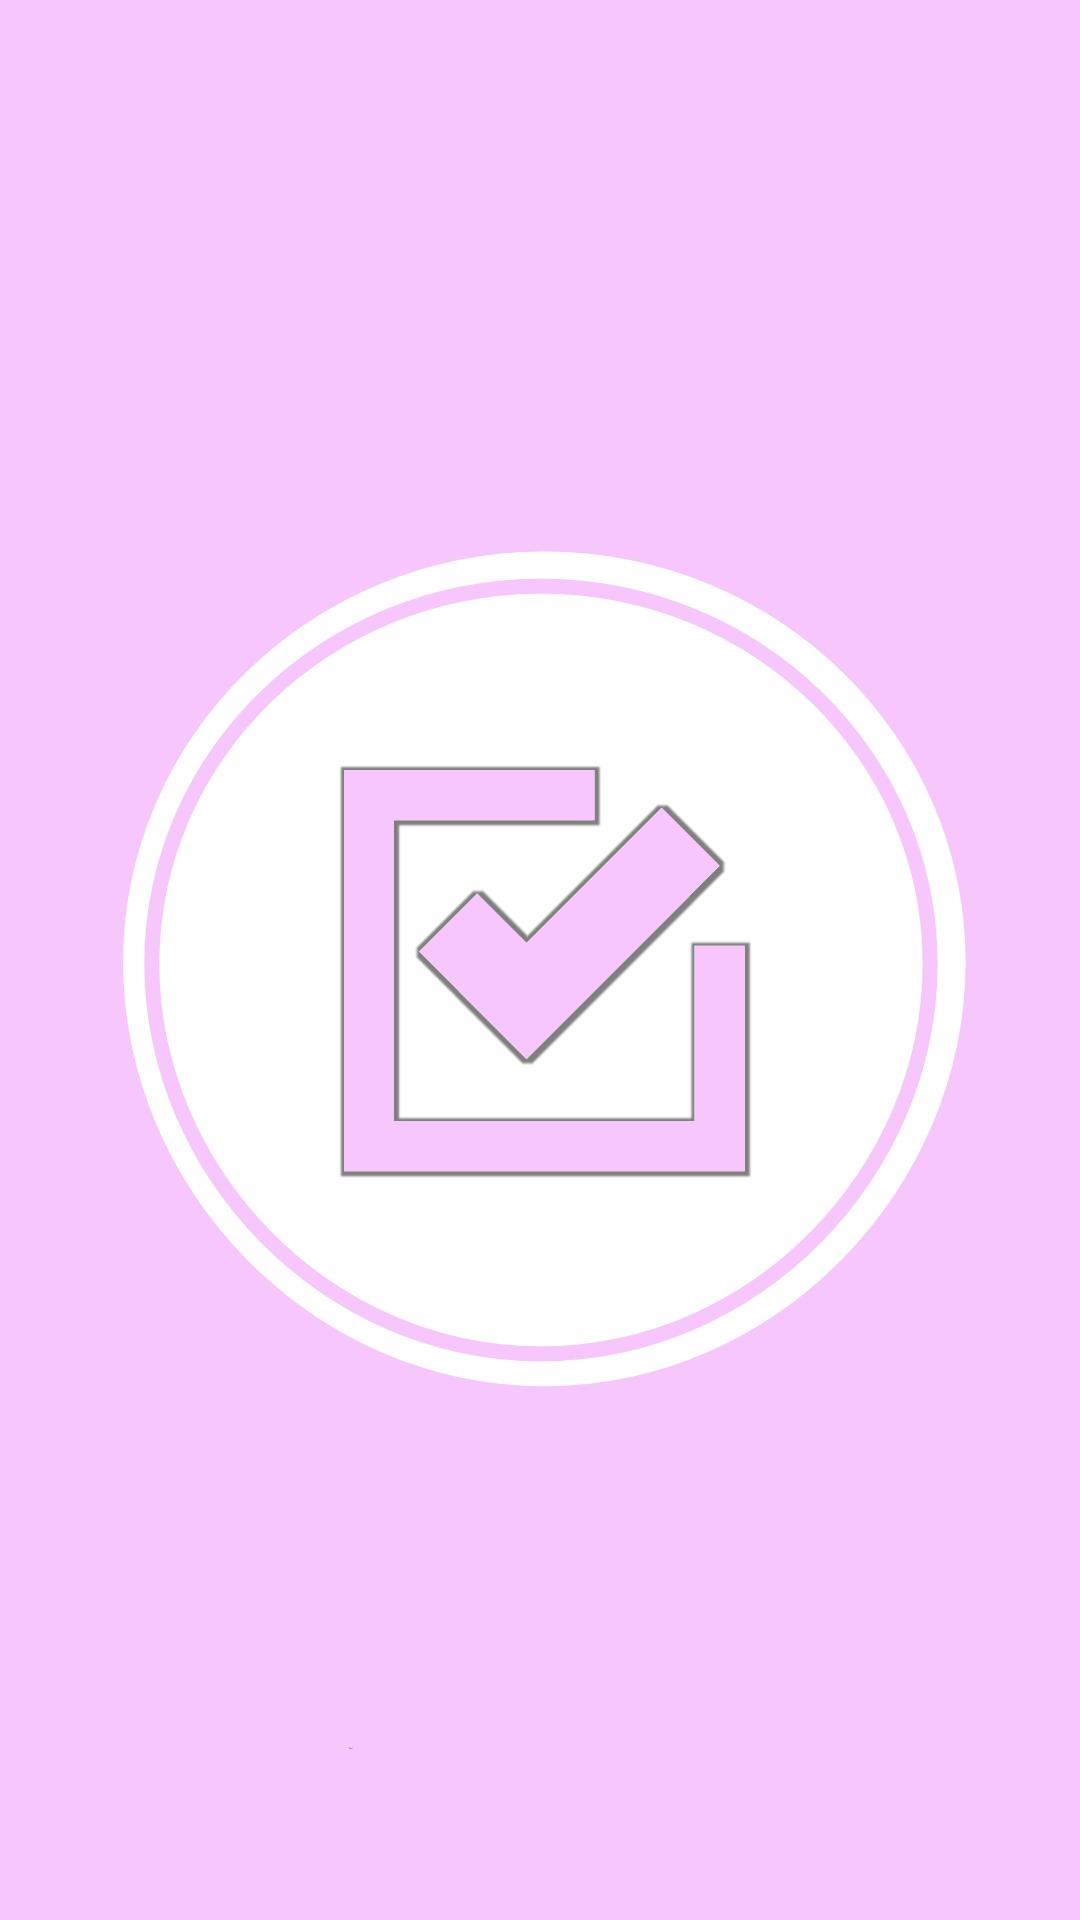 Instagram-cover-task-pink-lotnotes.com.jpg